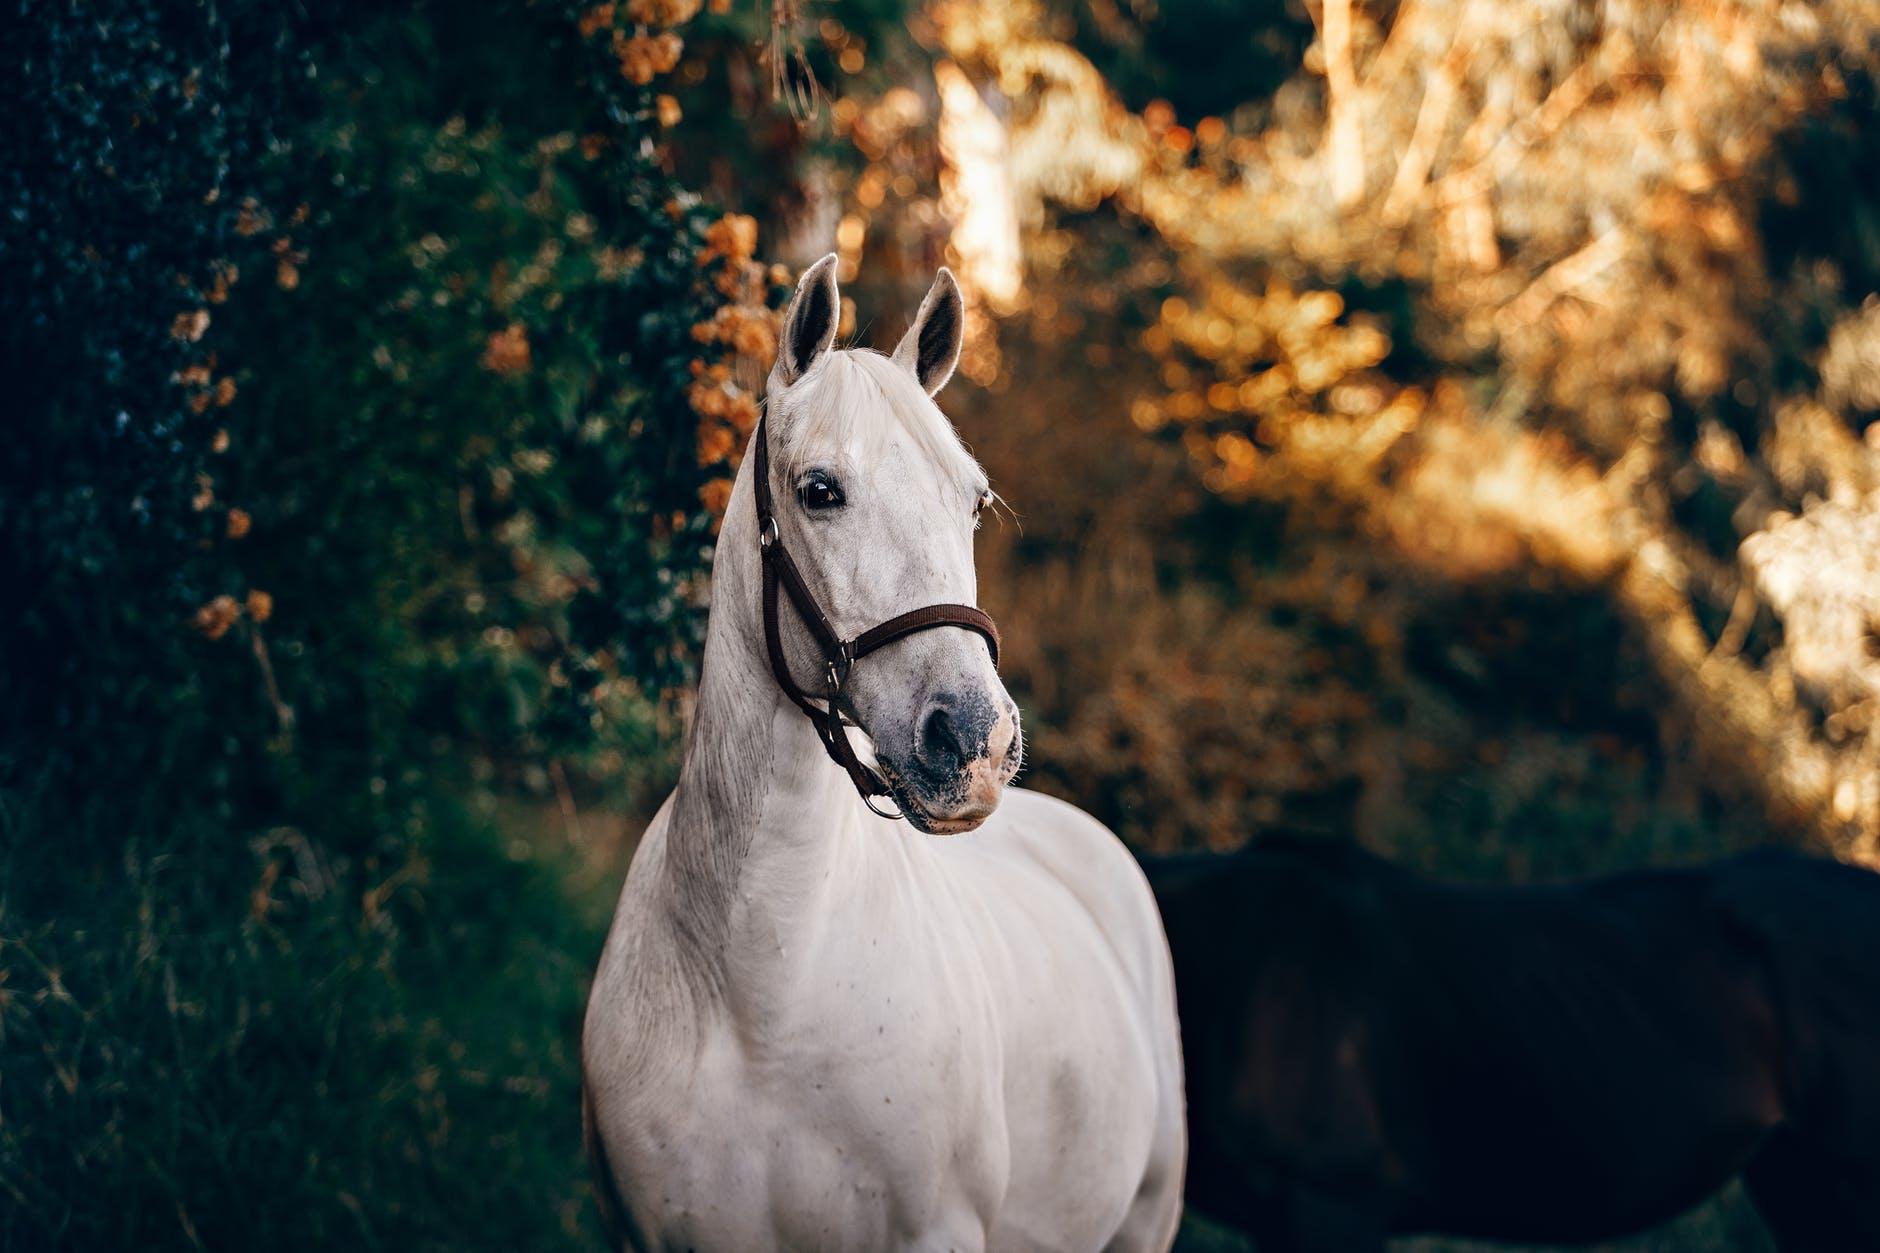 Izjade ar zirgu